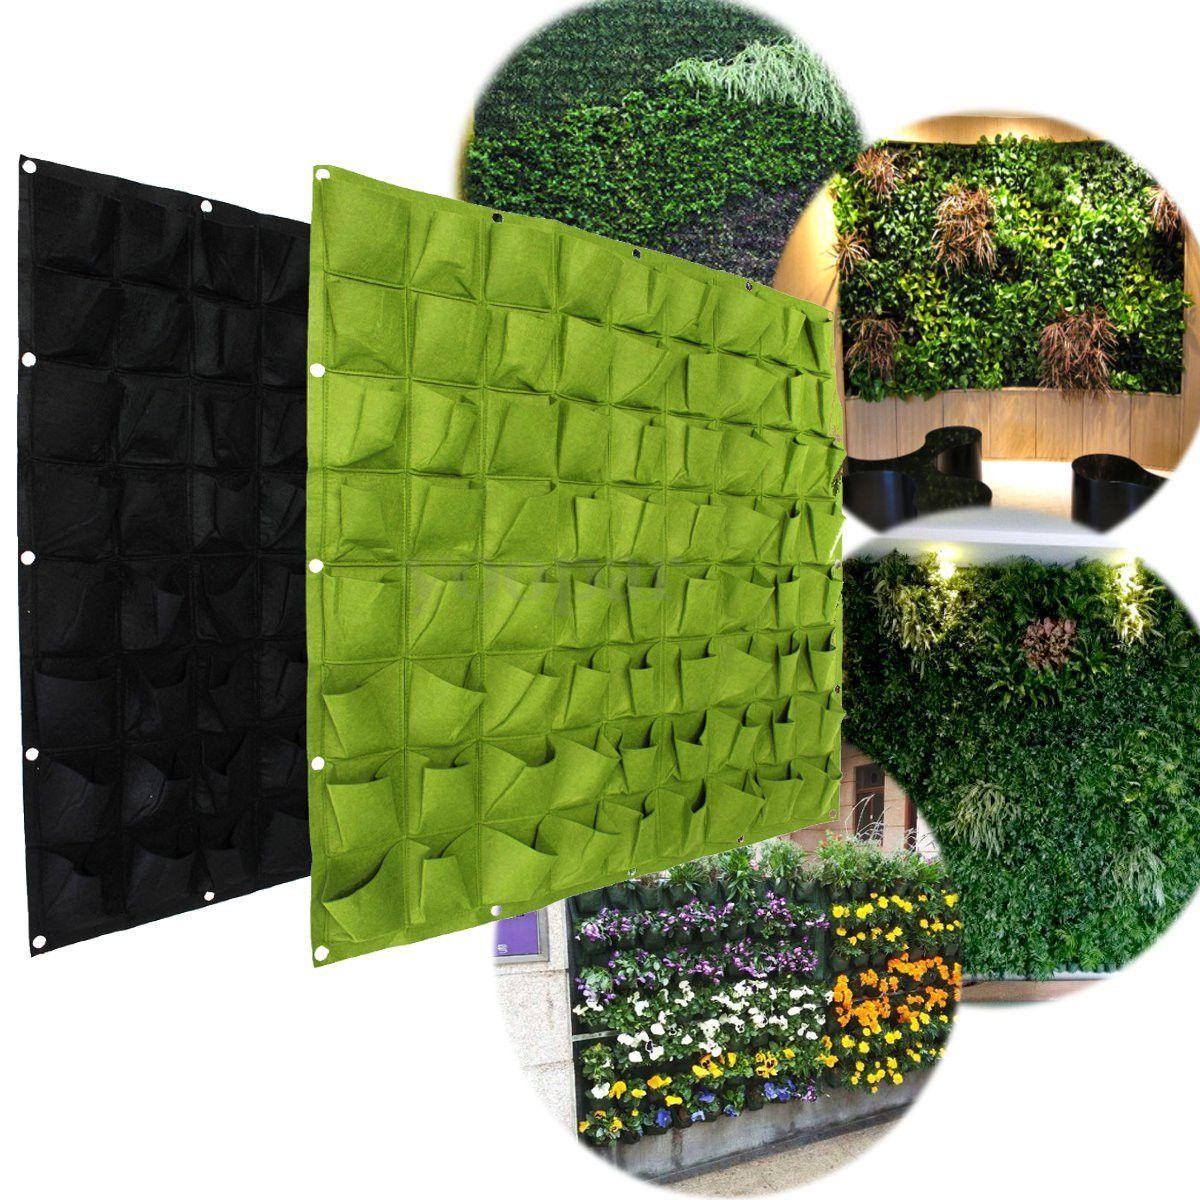 72 Wall Pockets Hanging Garden Wall Flower Planter Bag Indoor ...